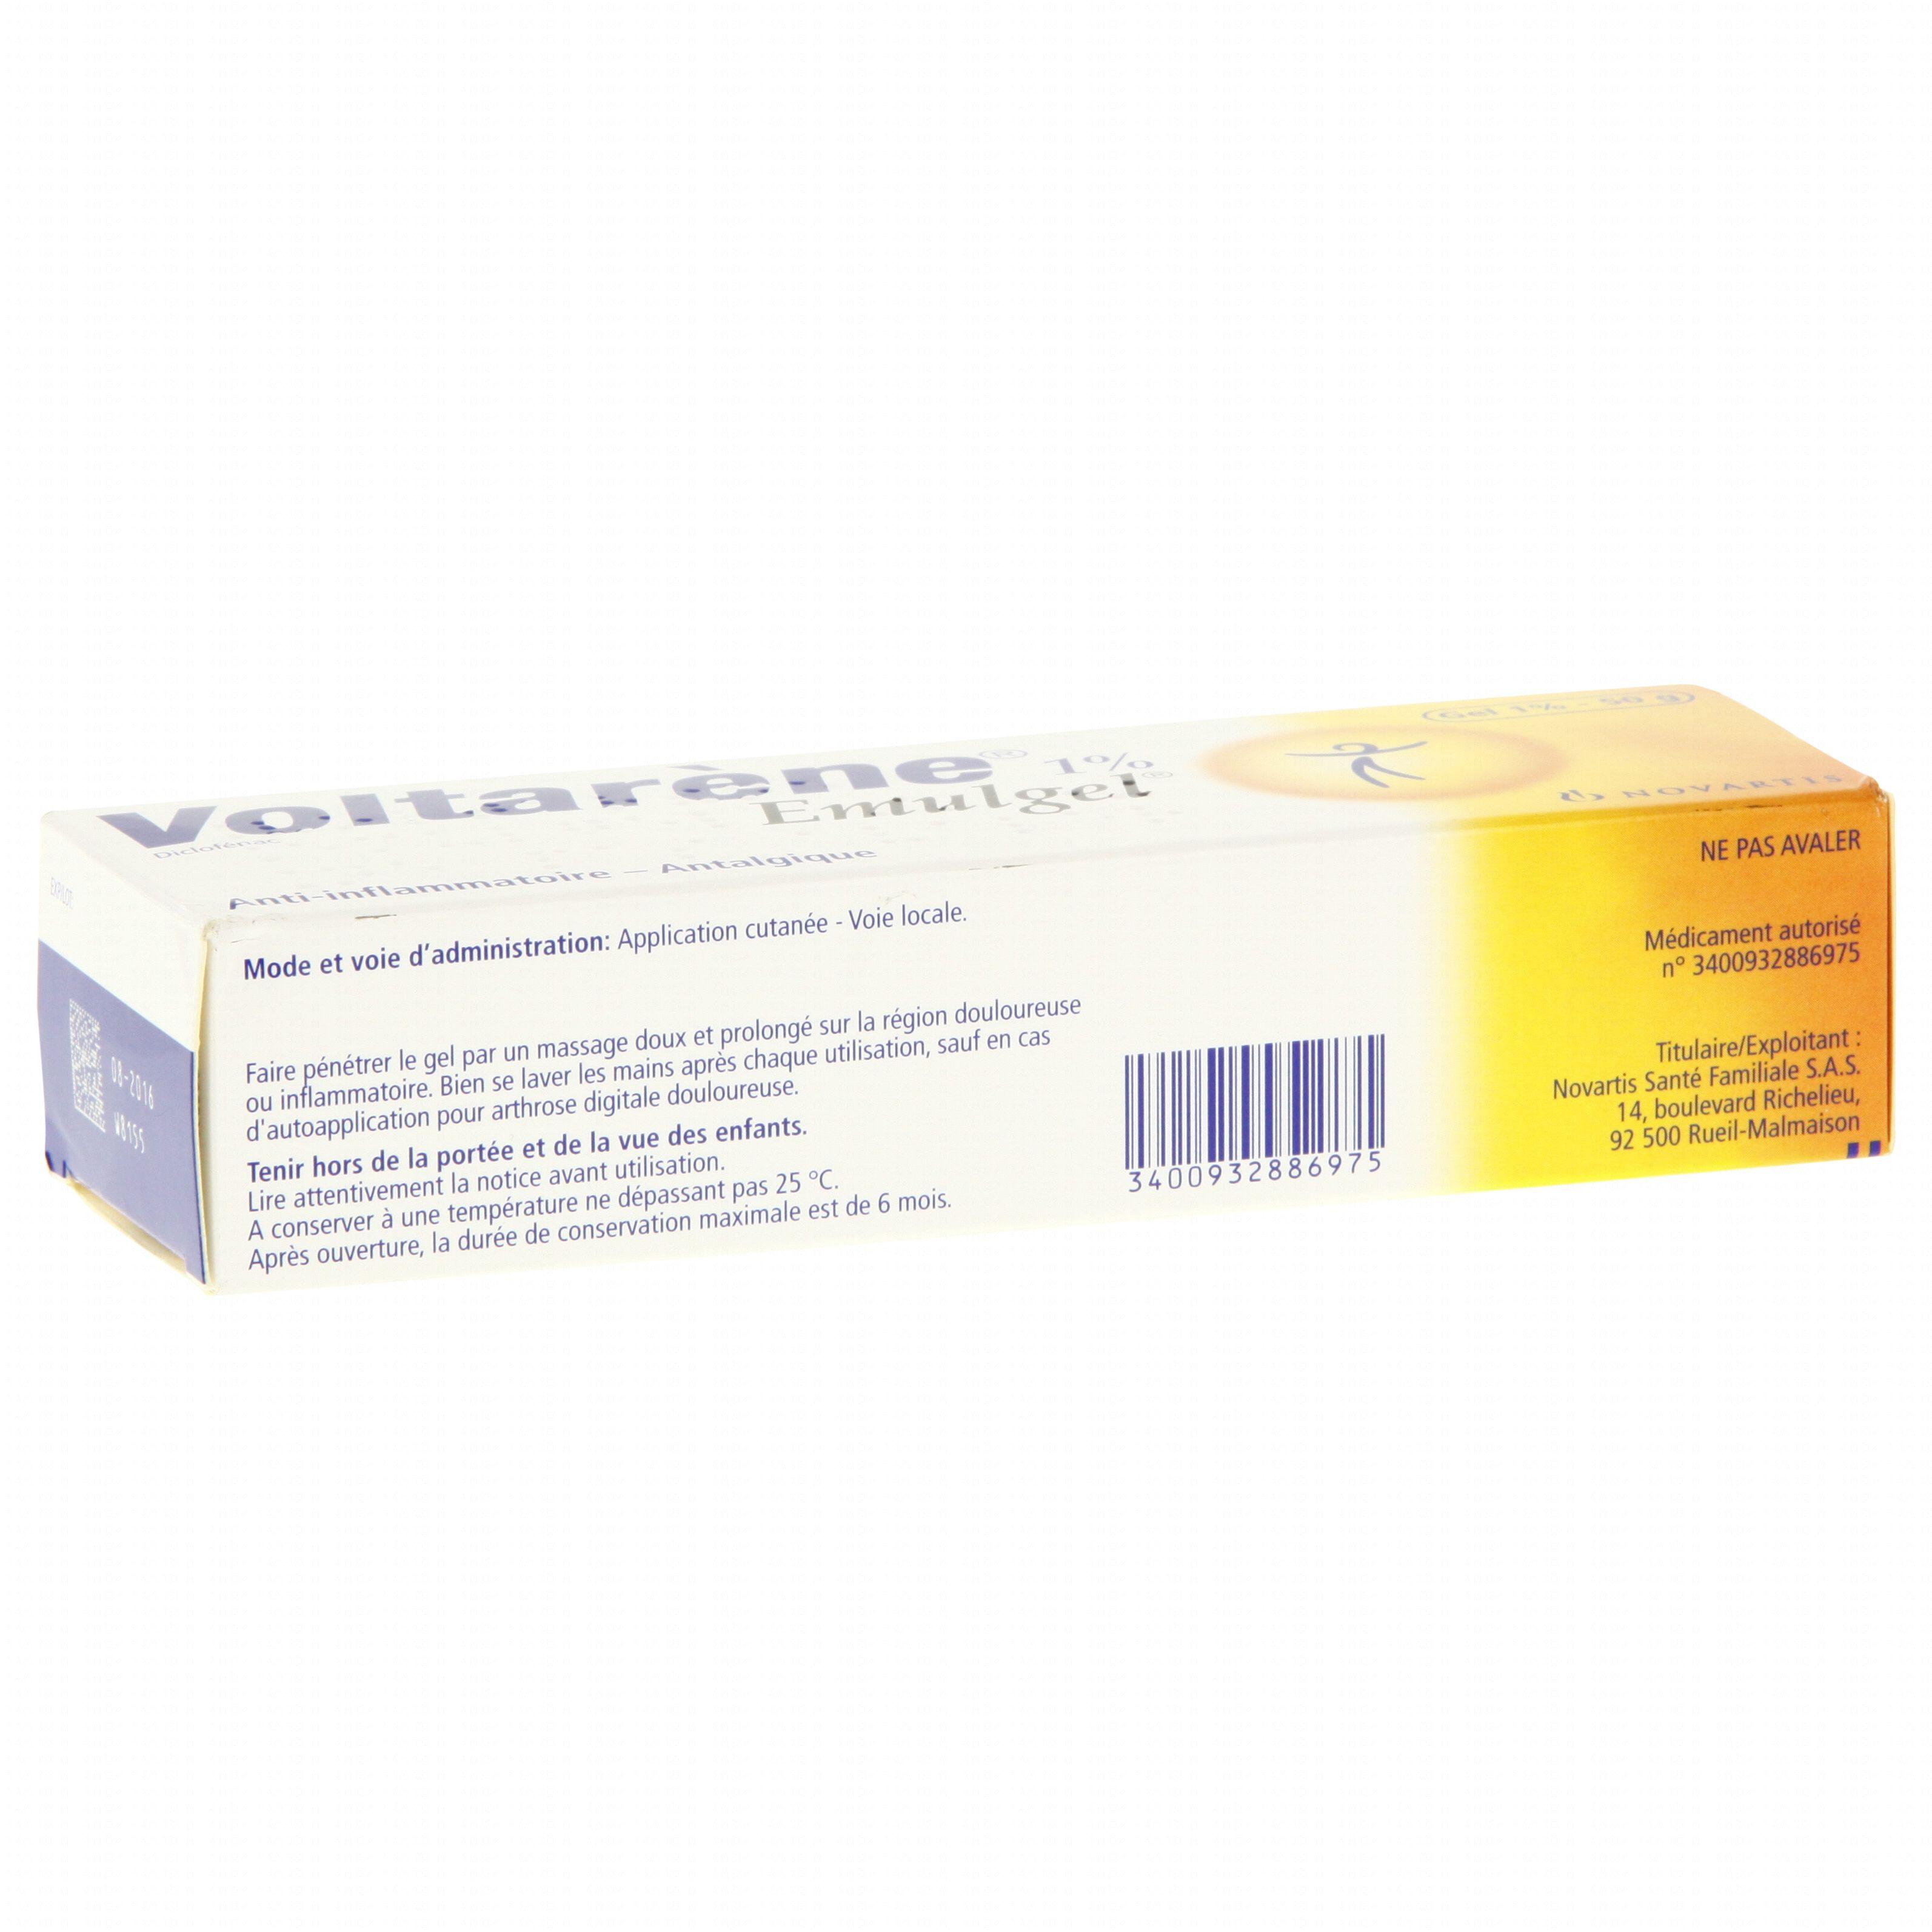 Diflucan 50 mg prix maroc - Dapoxetine 60 mg price